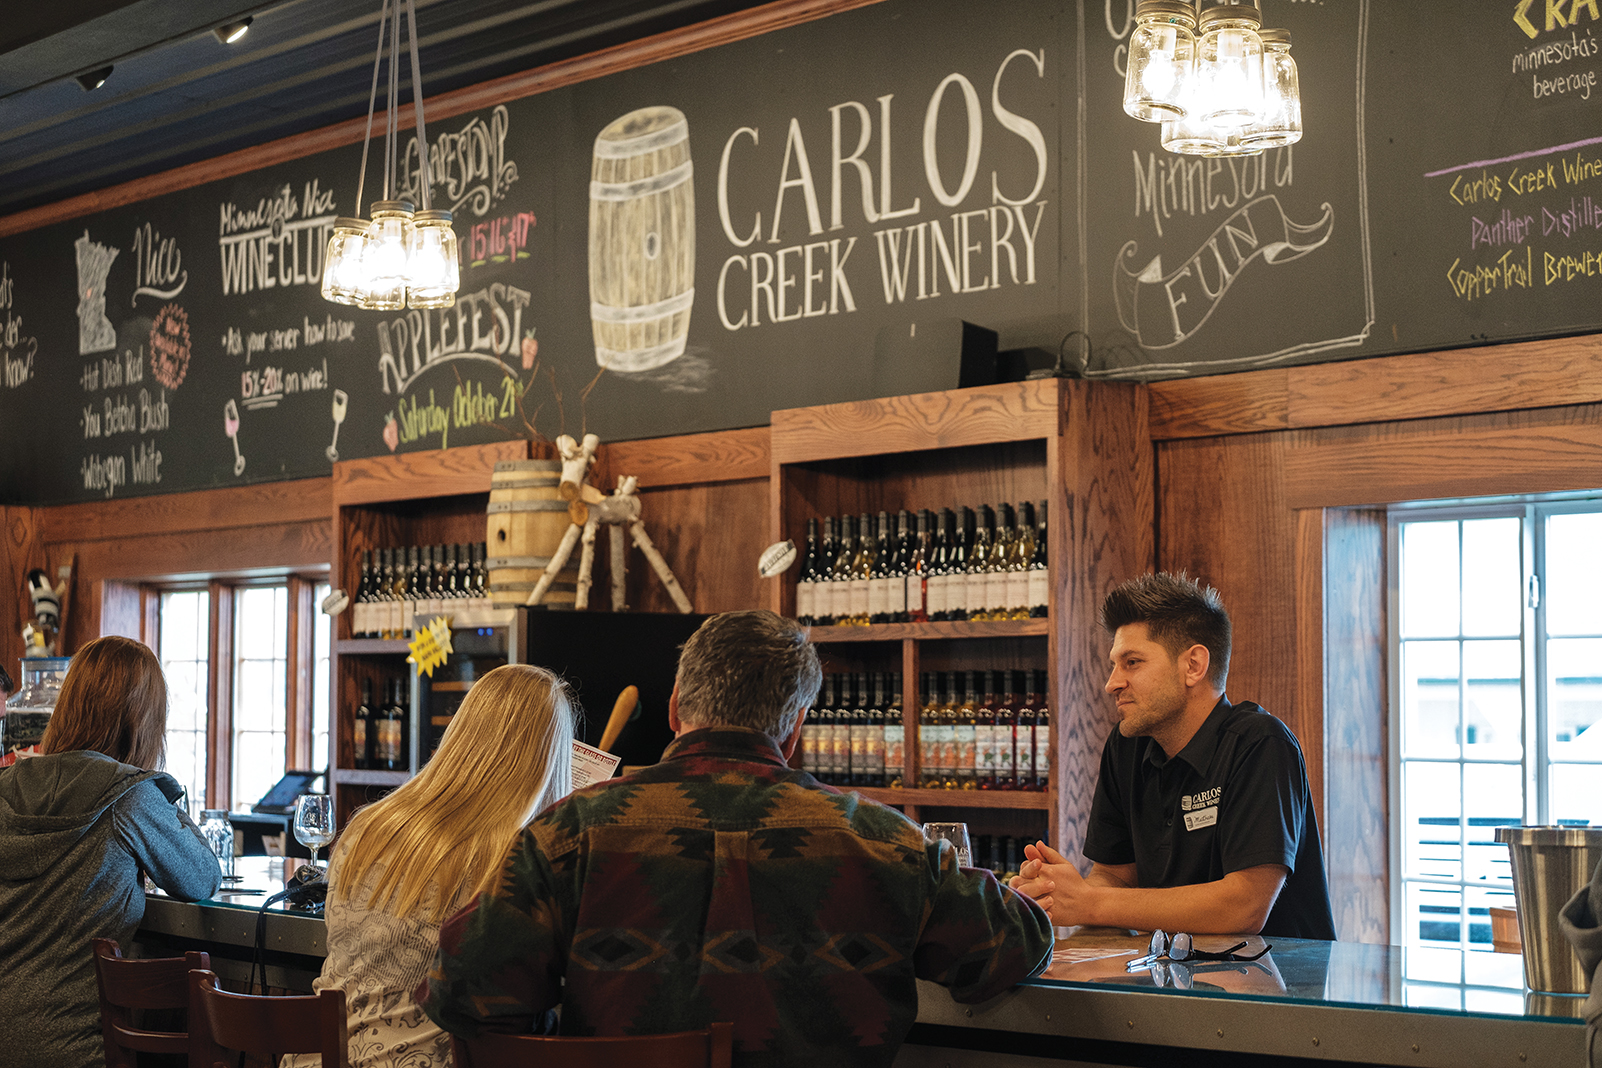 Carlos Creek Winery's tasting bar